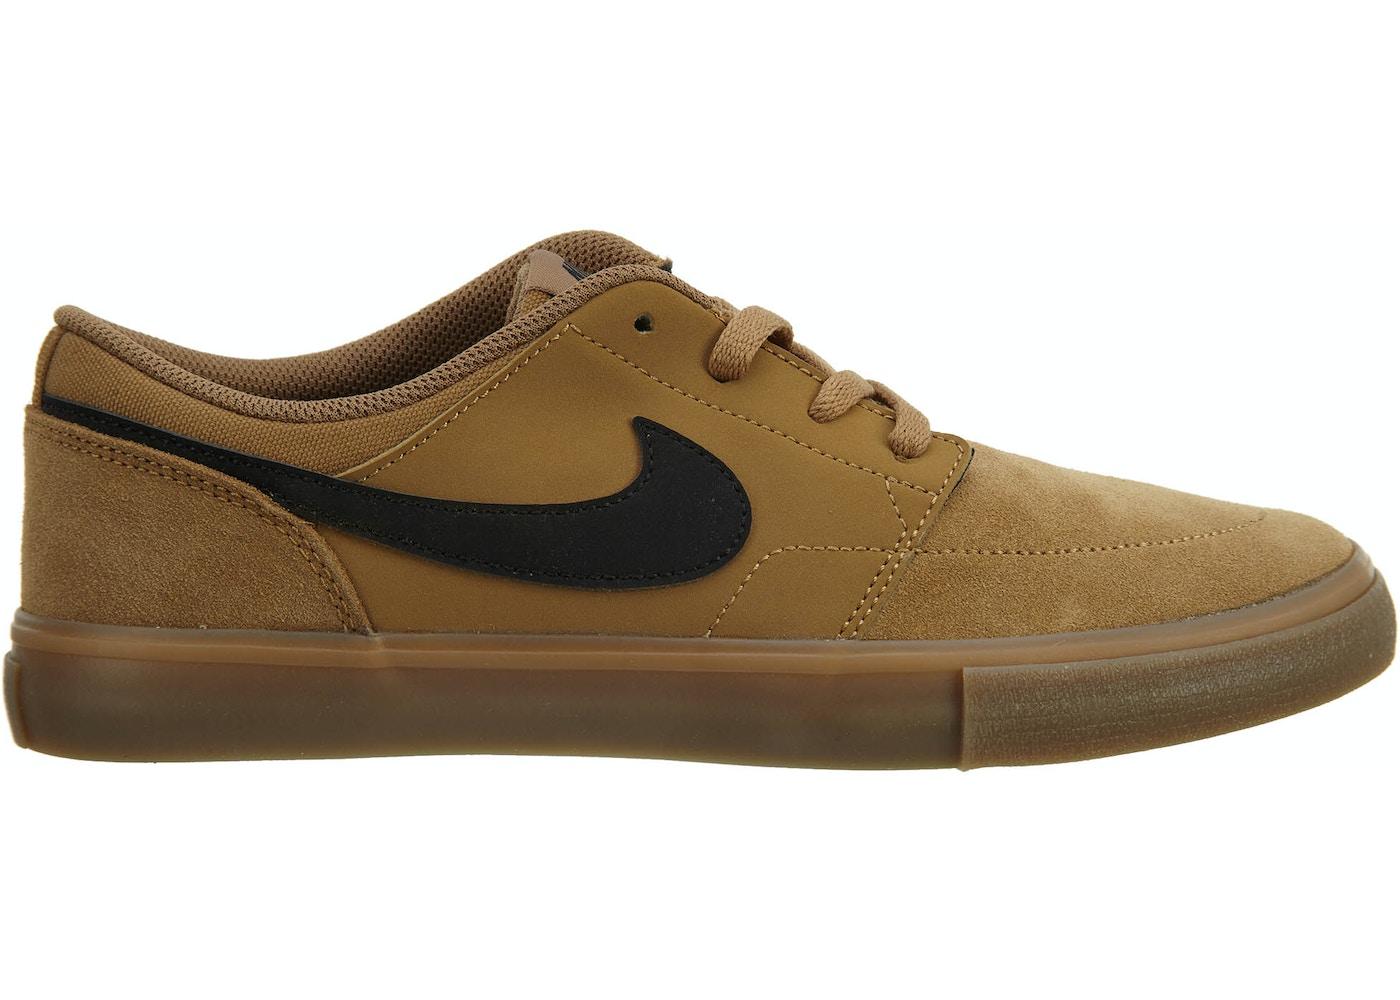 5bf25871b1 Nike Sb Portmore Ii Solar Golden Beige/Black - 880266-209 nike sb portmore